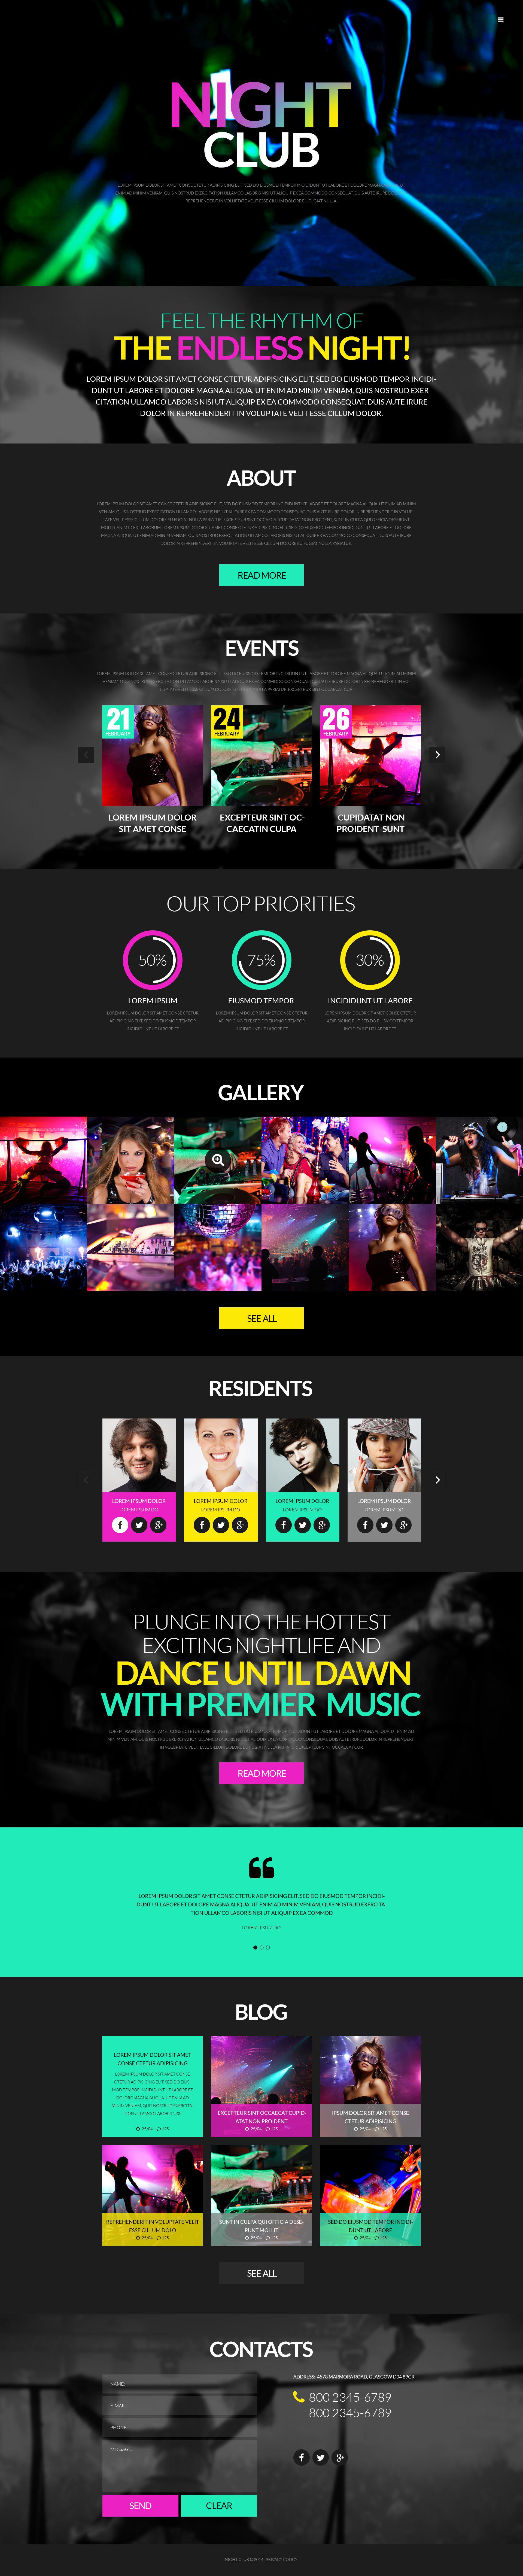 Responsive Party Wordpress #51986 - Ekran resmi